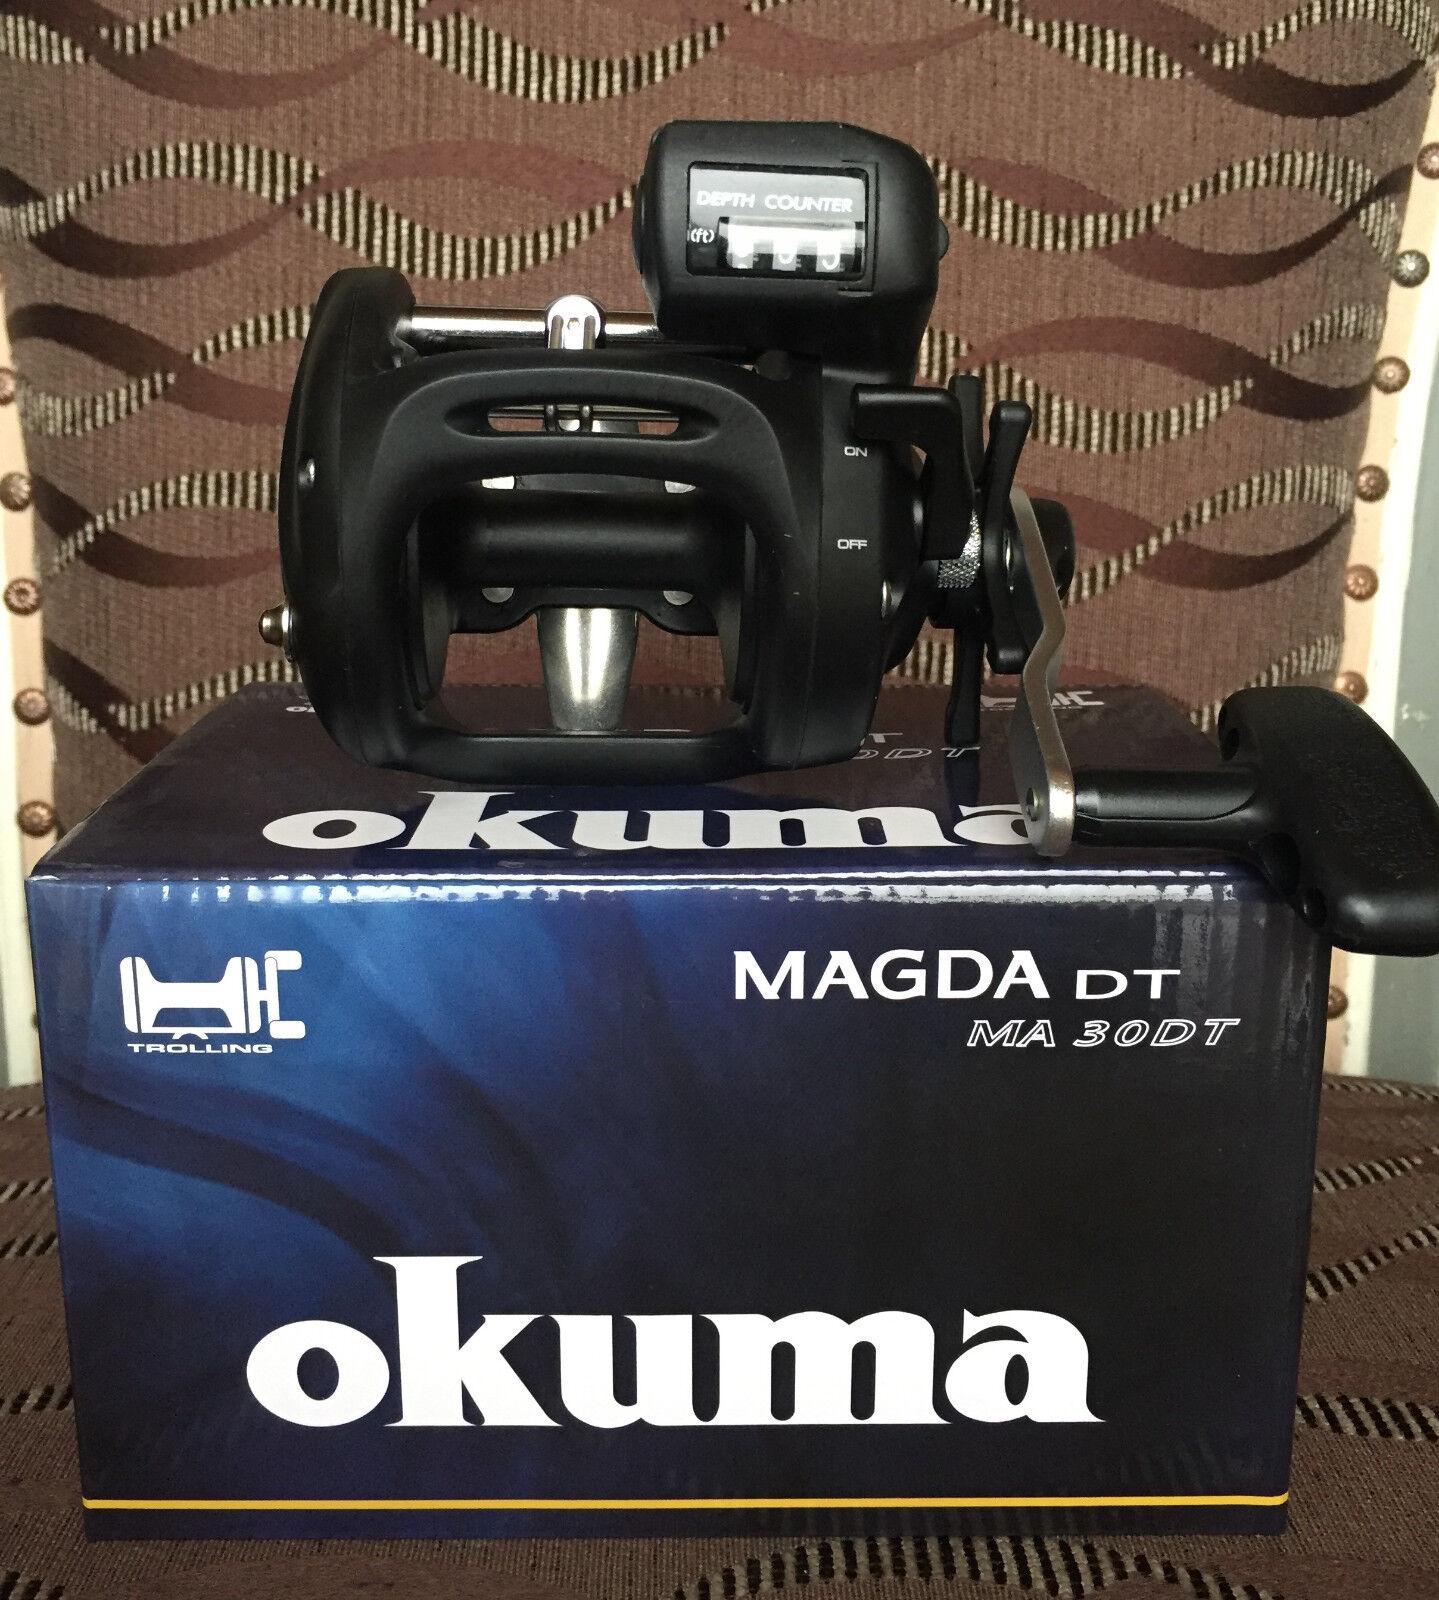 Okuma Magda DT ma30dt multi ruolo